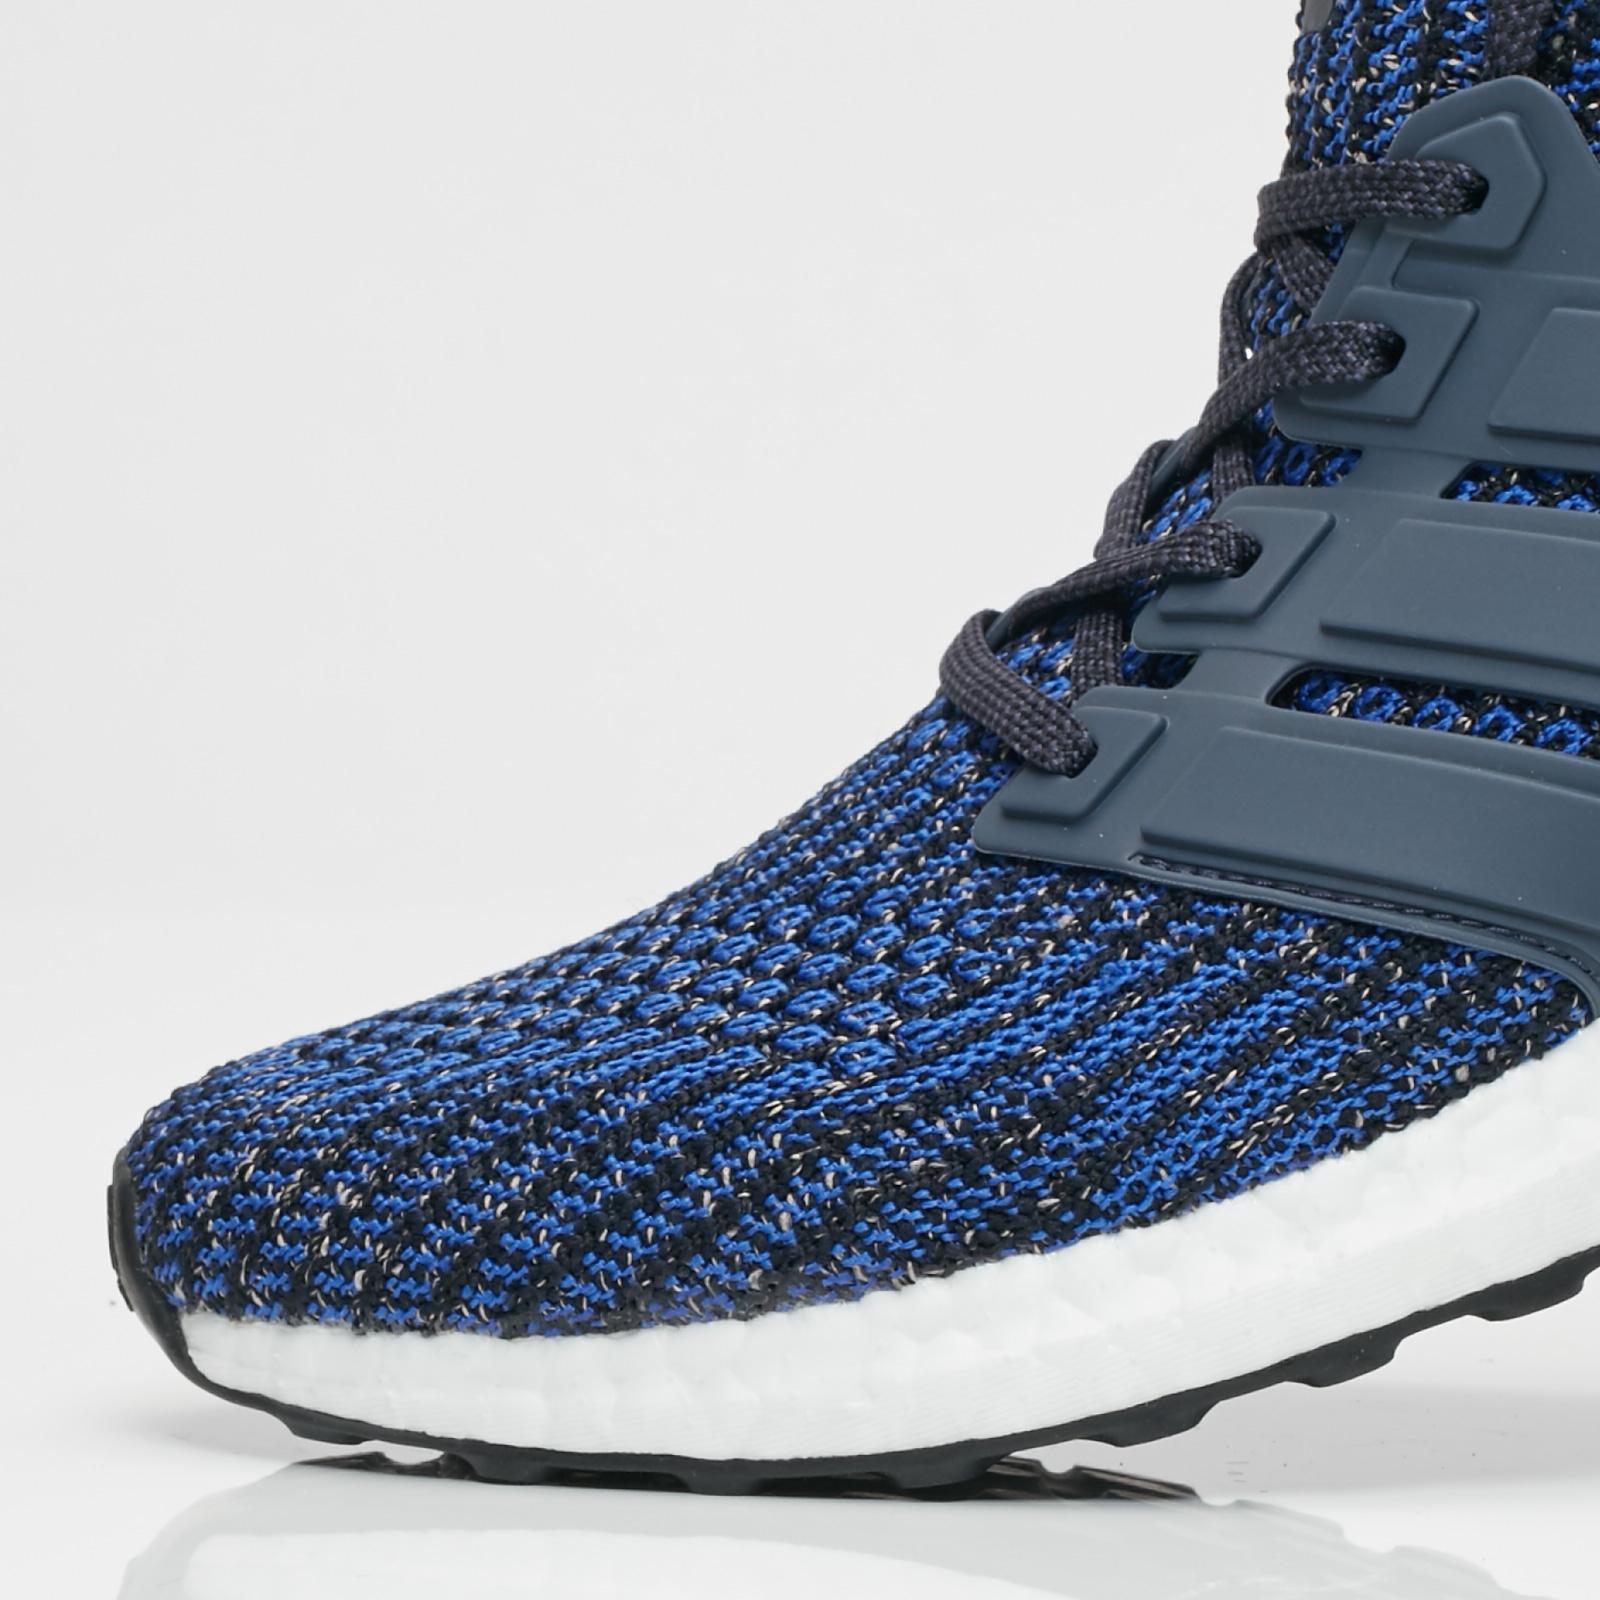 b1f0bea2624 adidas UltraBOOST - Cp9250 - Sneakersnstuff